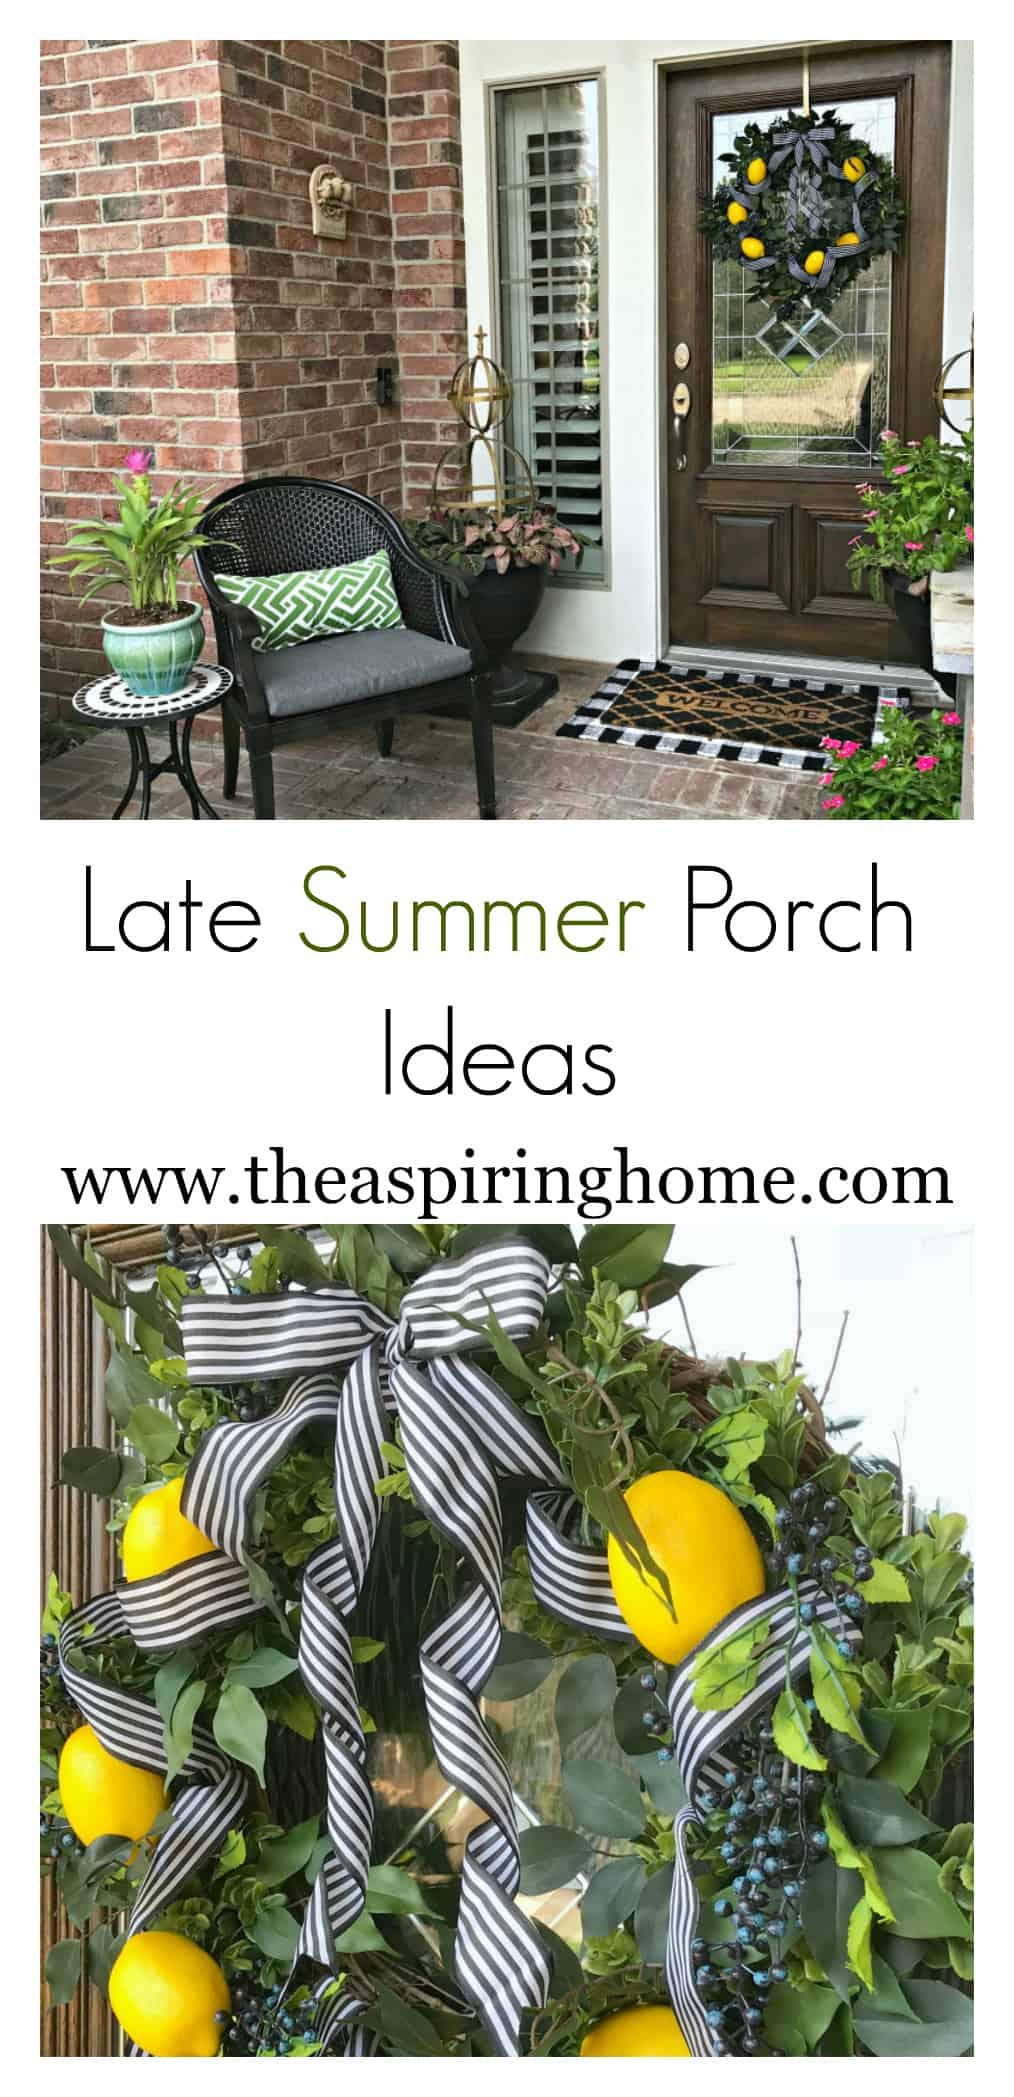 Late Summer Porch Ideas